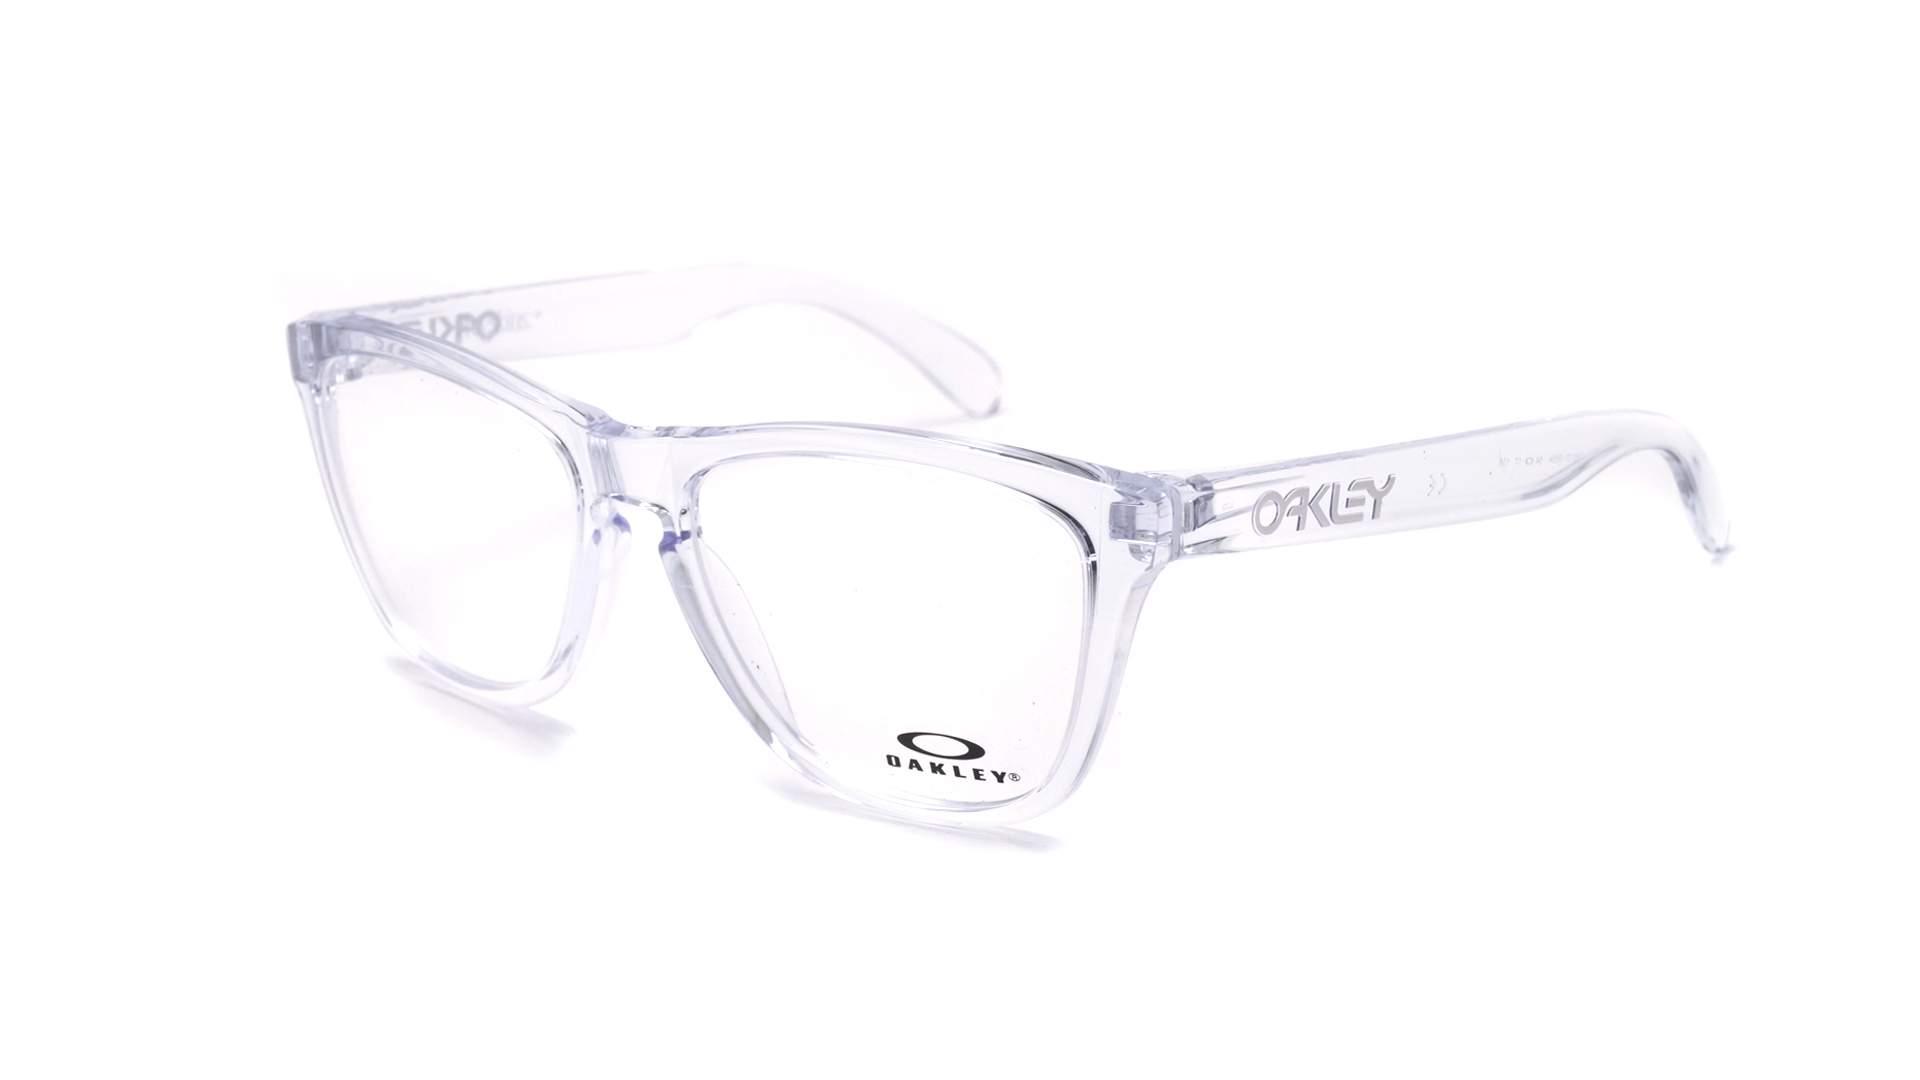 1d53de0a2c Eyeglasses Oakley Frogskins Clear OX8131 06 54-17 Medium